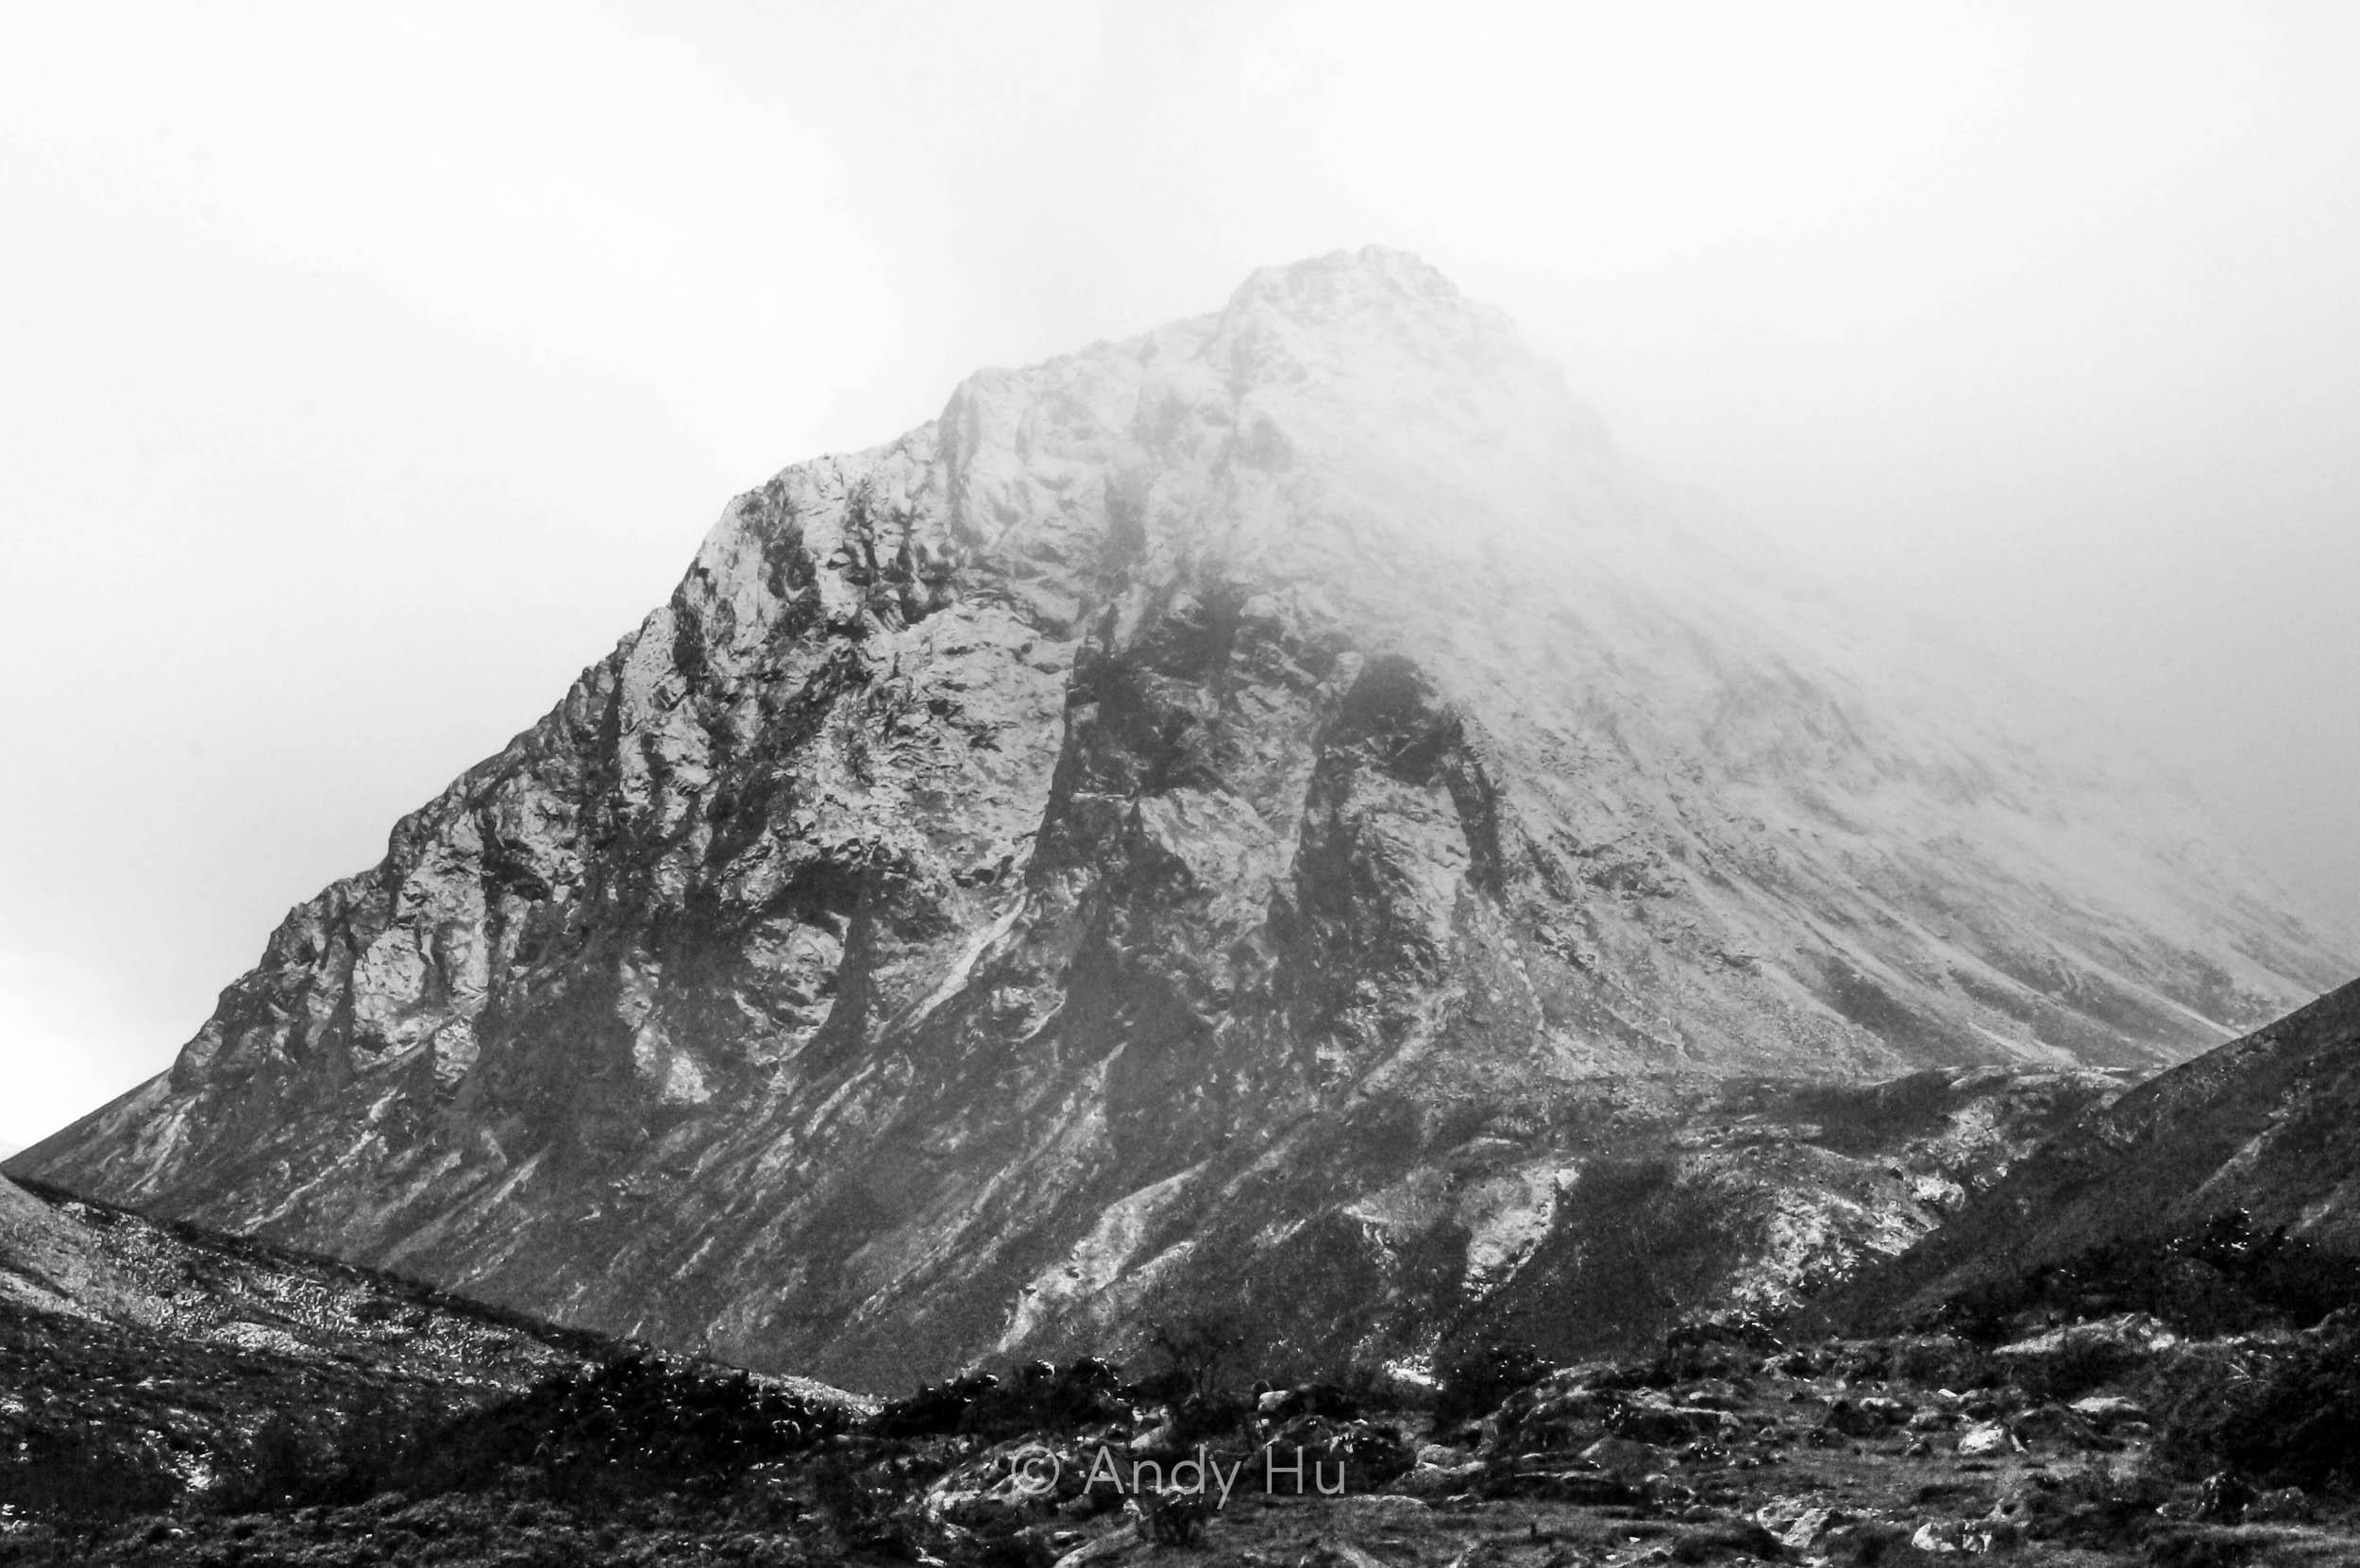 Mountains in Blizzard, Mt. Gongga Trek